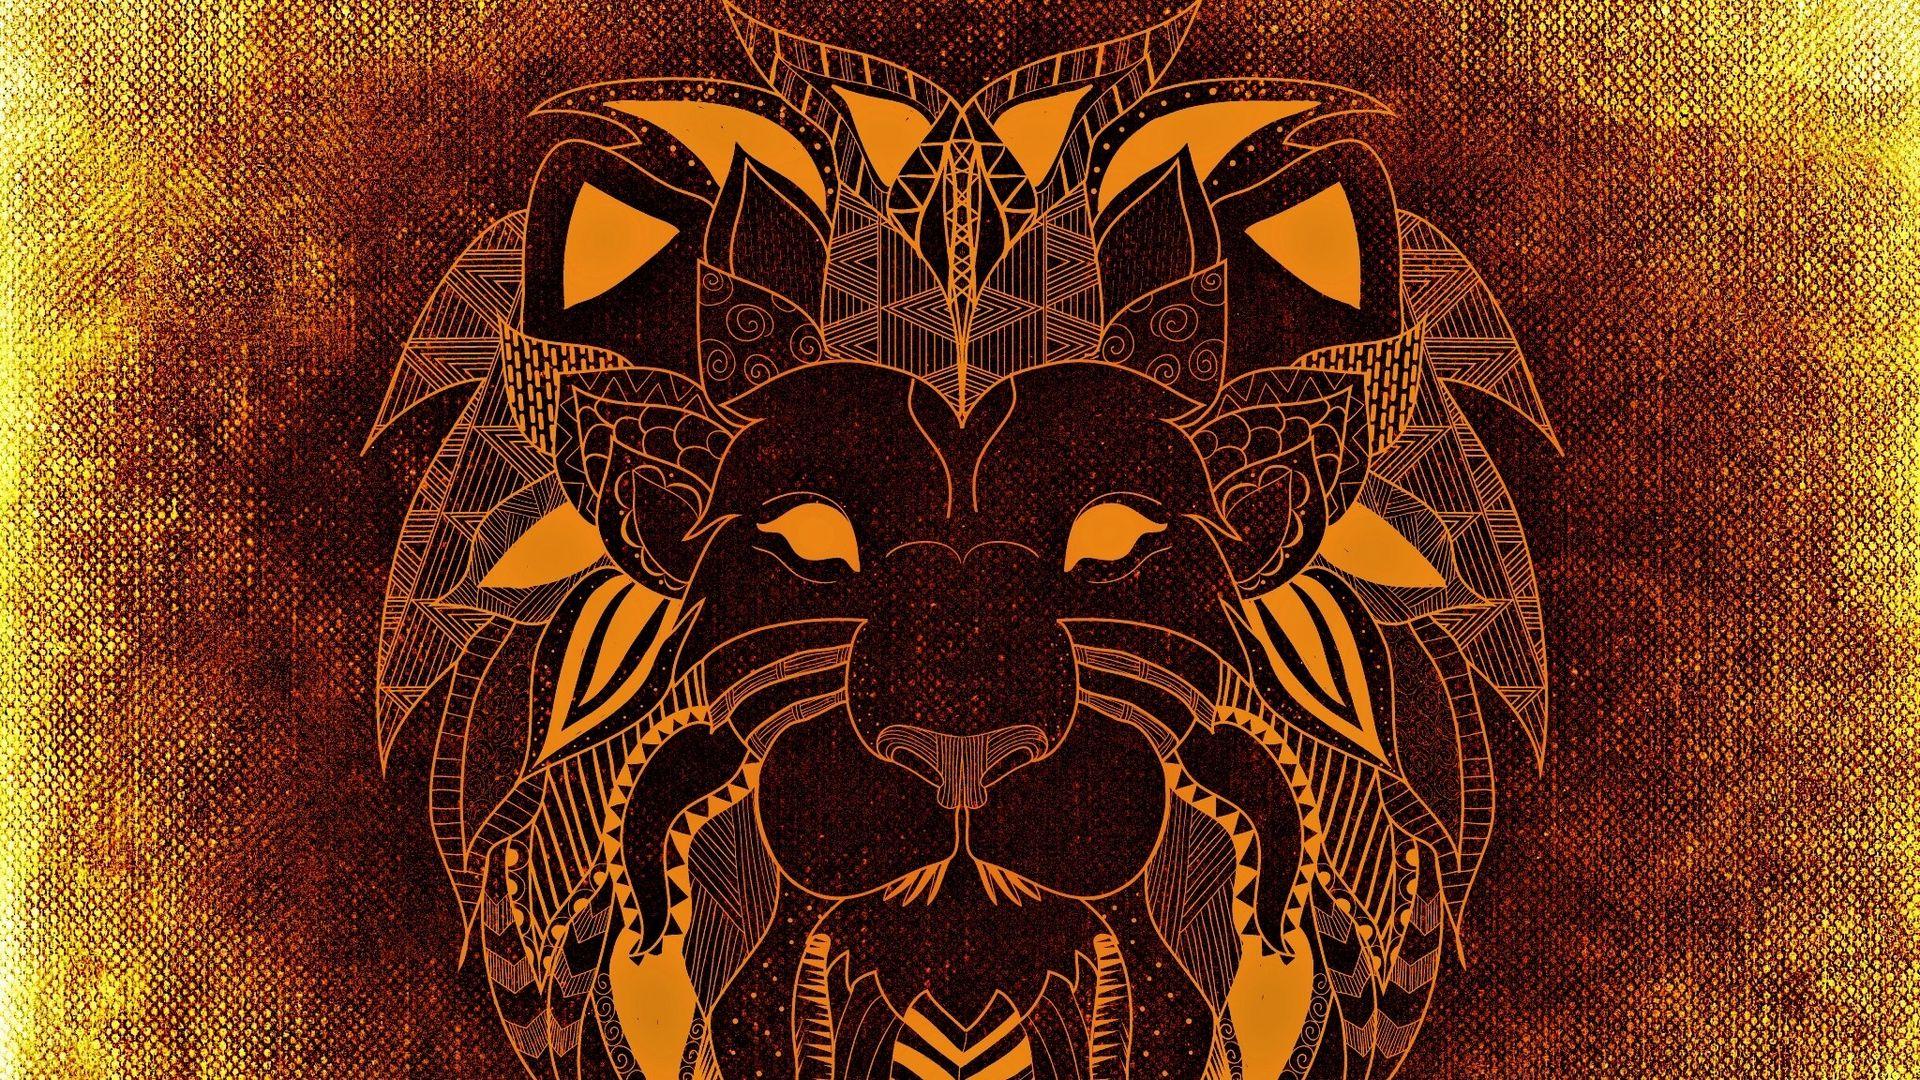 Lion Art wallpaper image